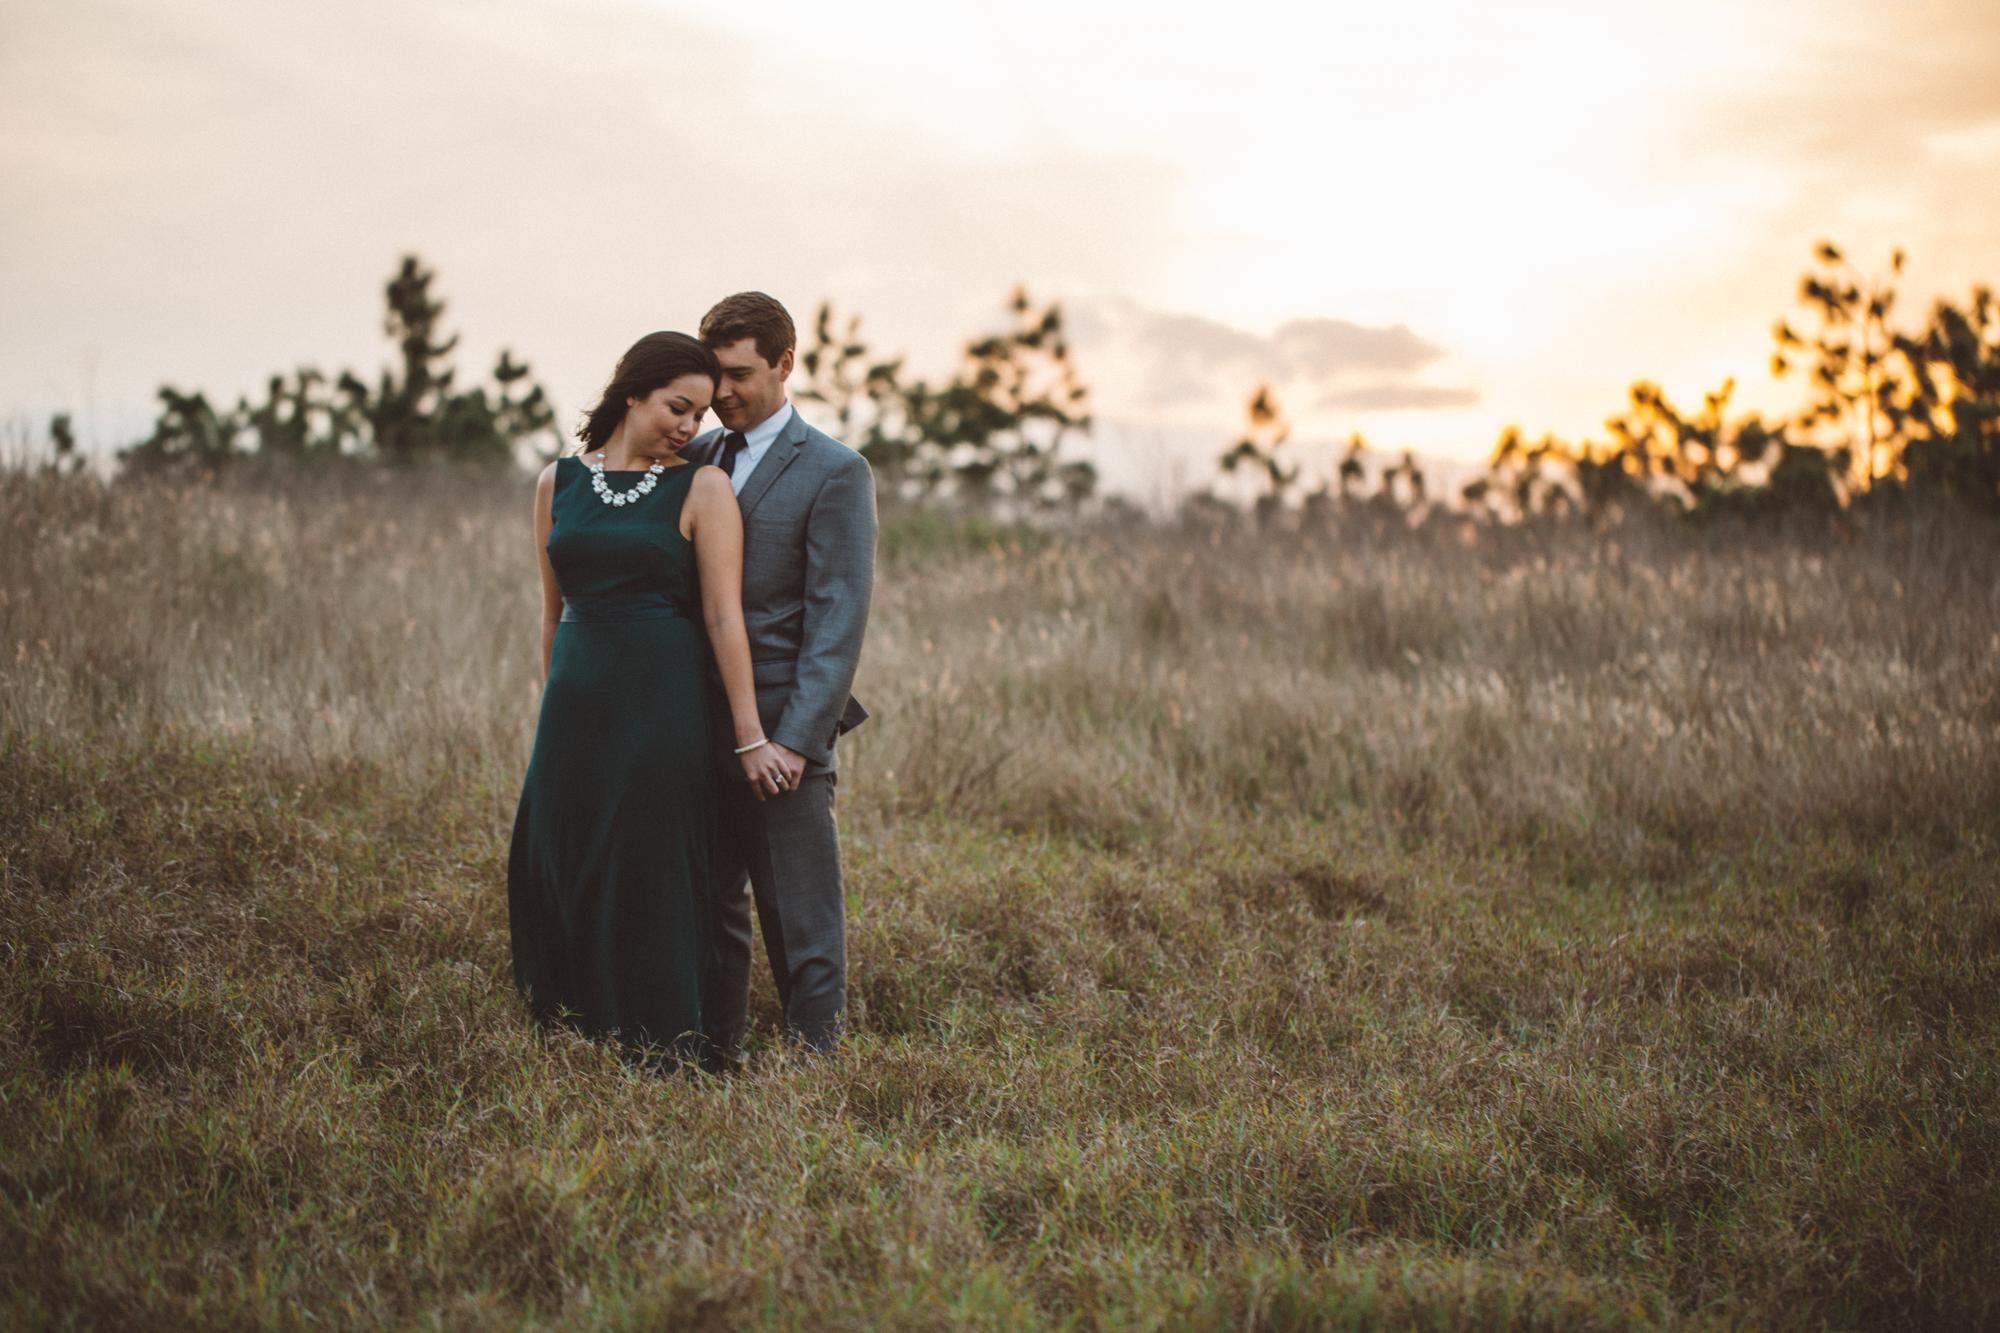 Orlando Engagement Photographer-79.jpg